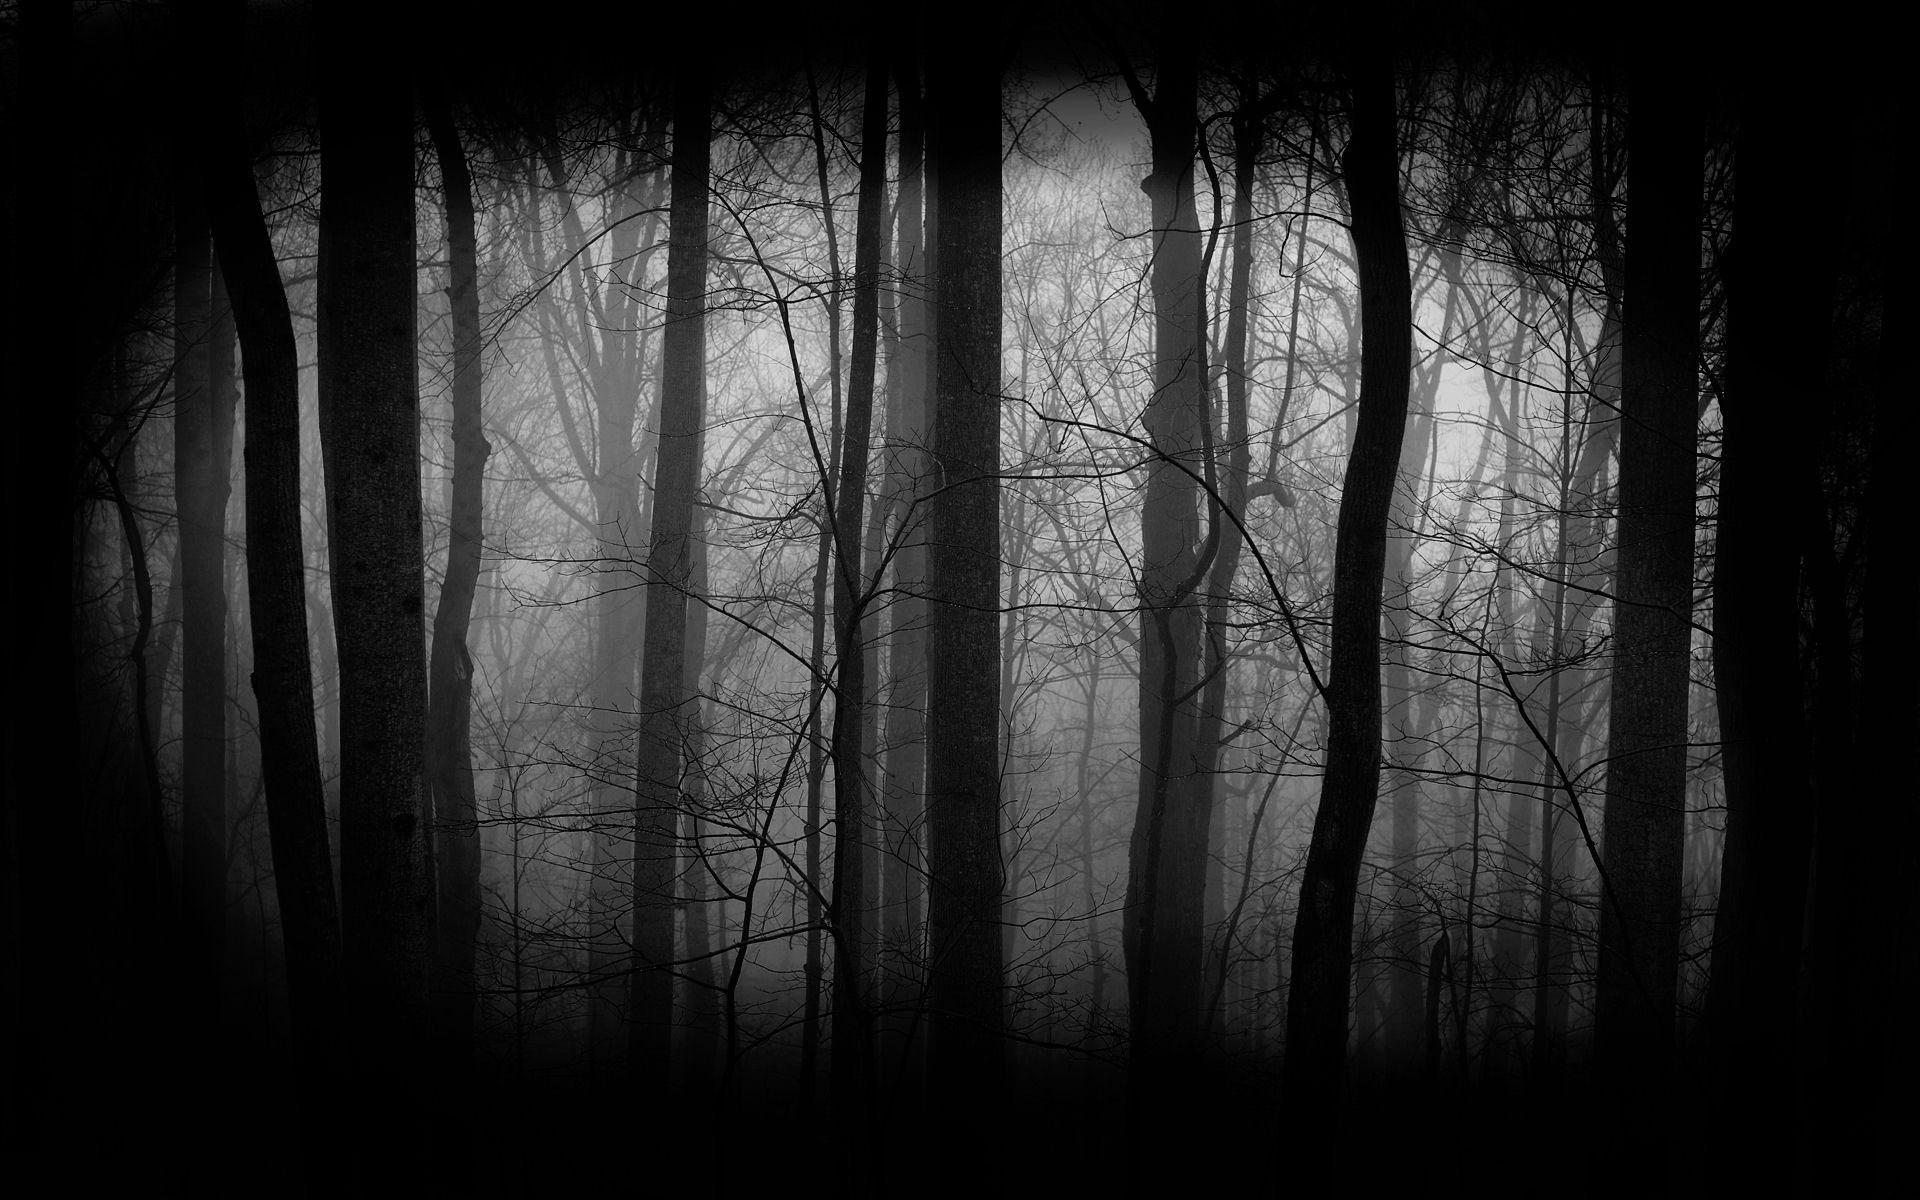 5435251_144067962011_Dark-Forest-Wallpaper-3.jpg